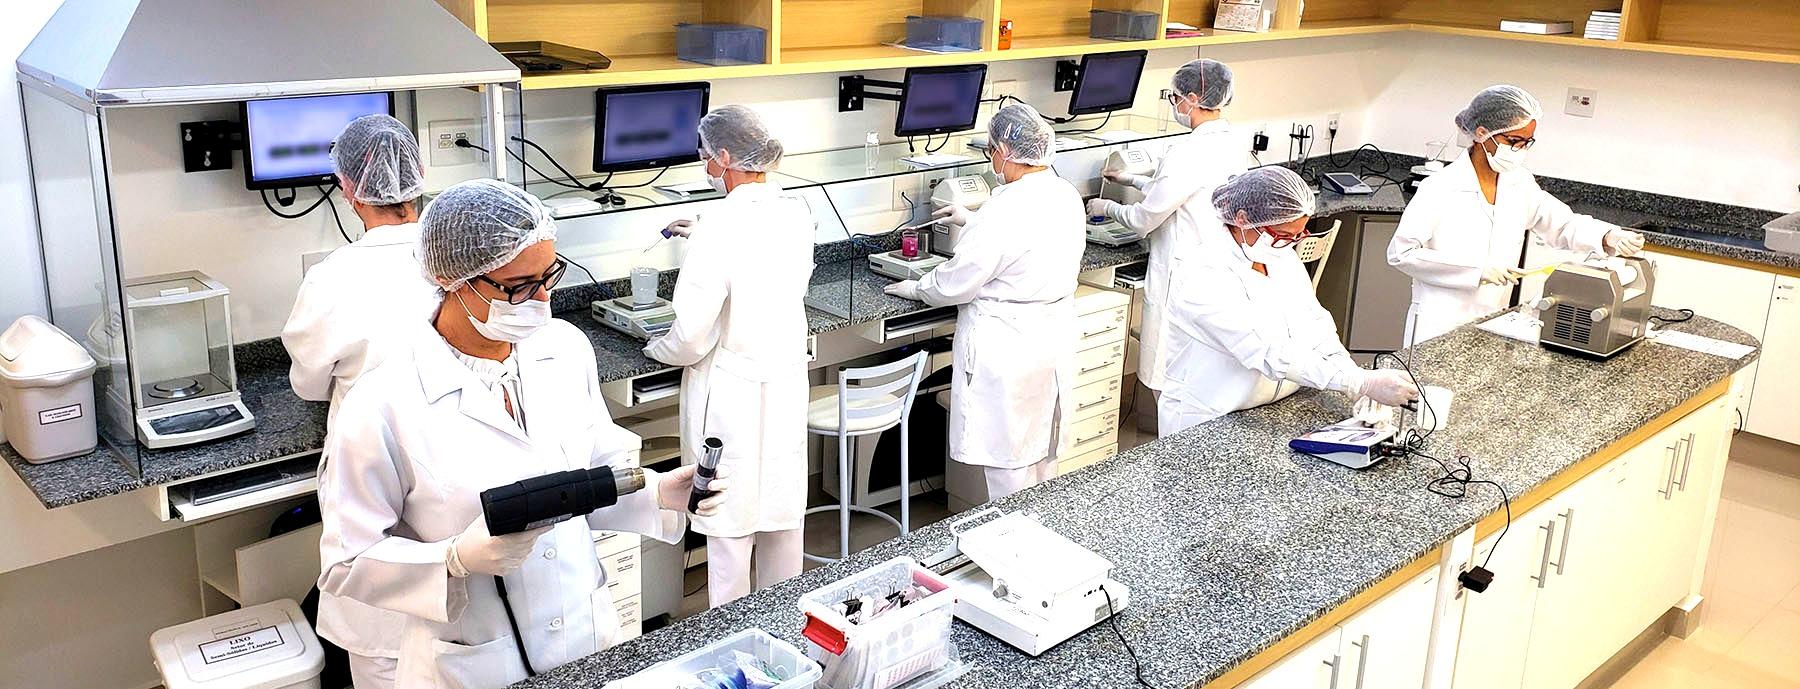 farmacia-formulacom-laboratorio%20(6)_ed